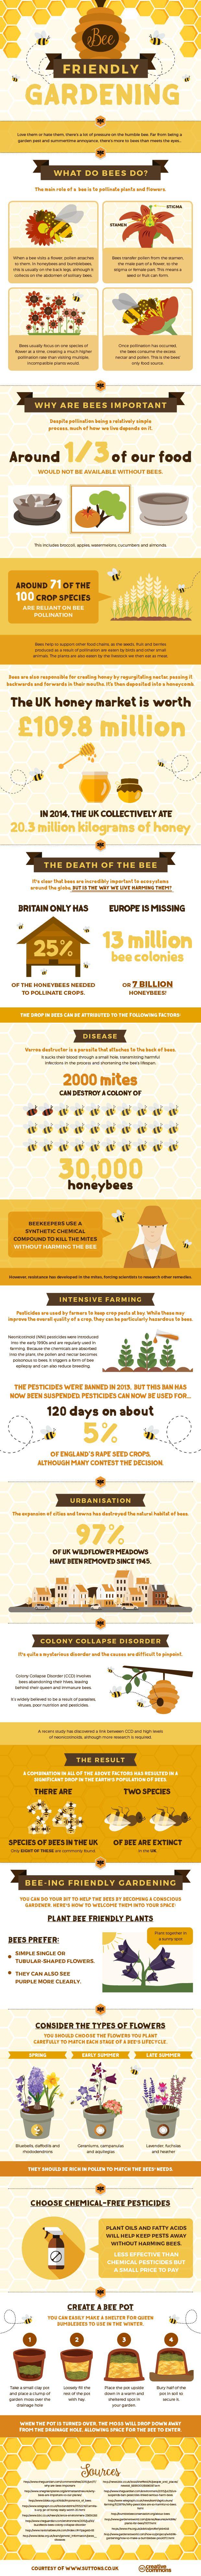 Bee Friendly Gardening #infographic #Bee #Gardening